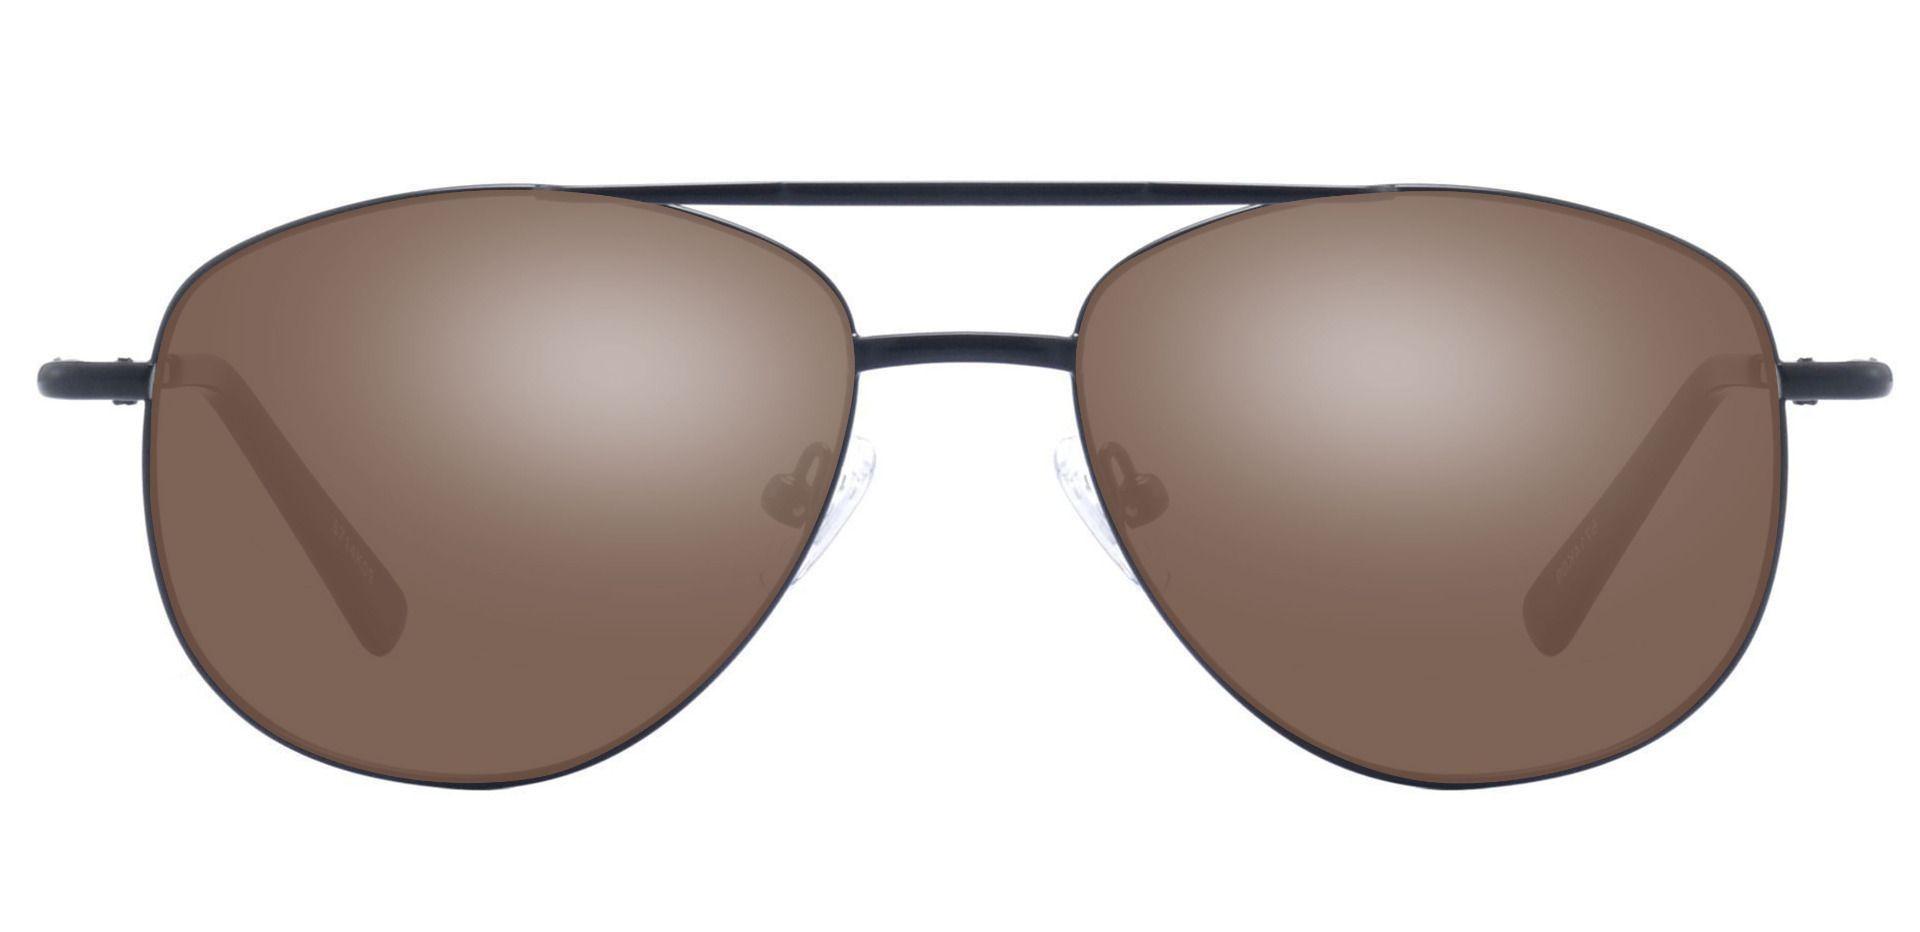 Dwight Aviator Prescription Sunglasses - Black Frame With Brown Lenses